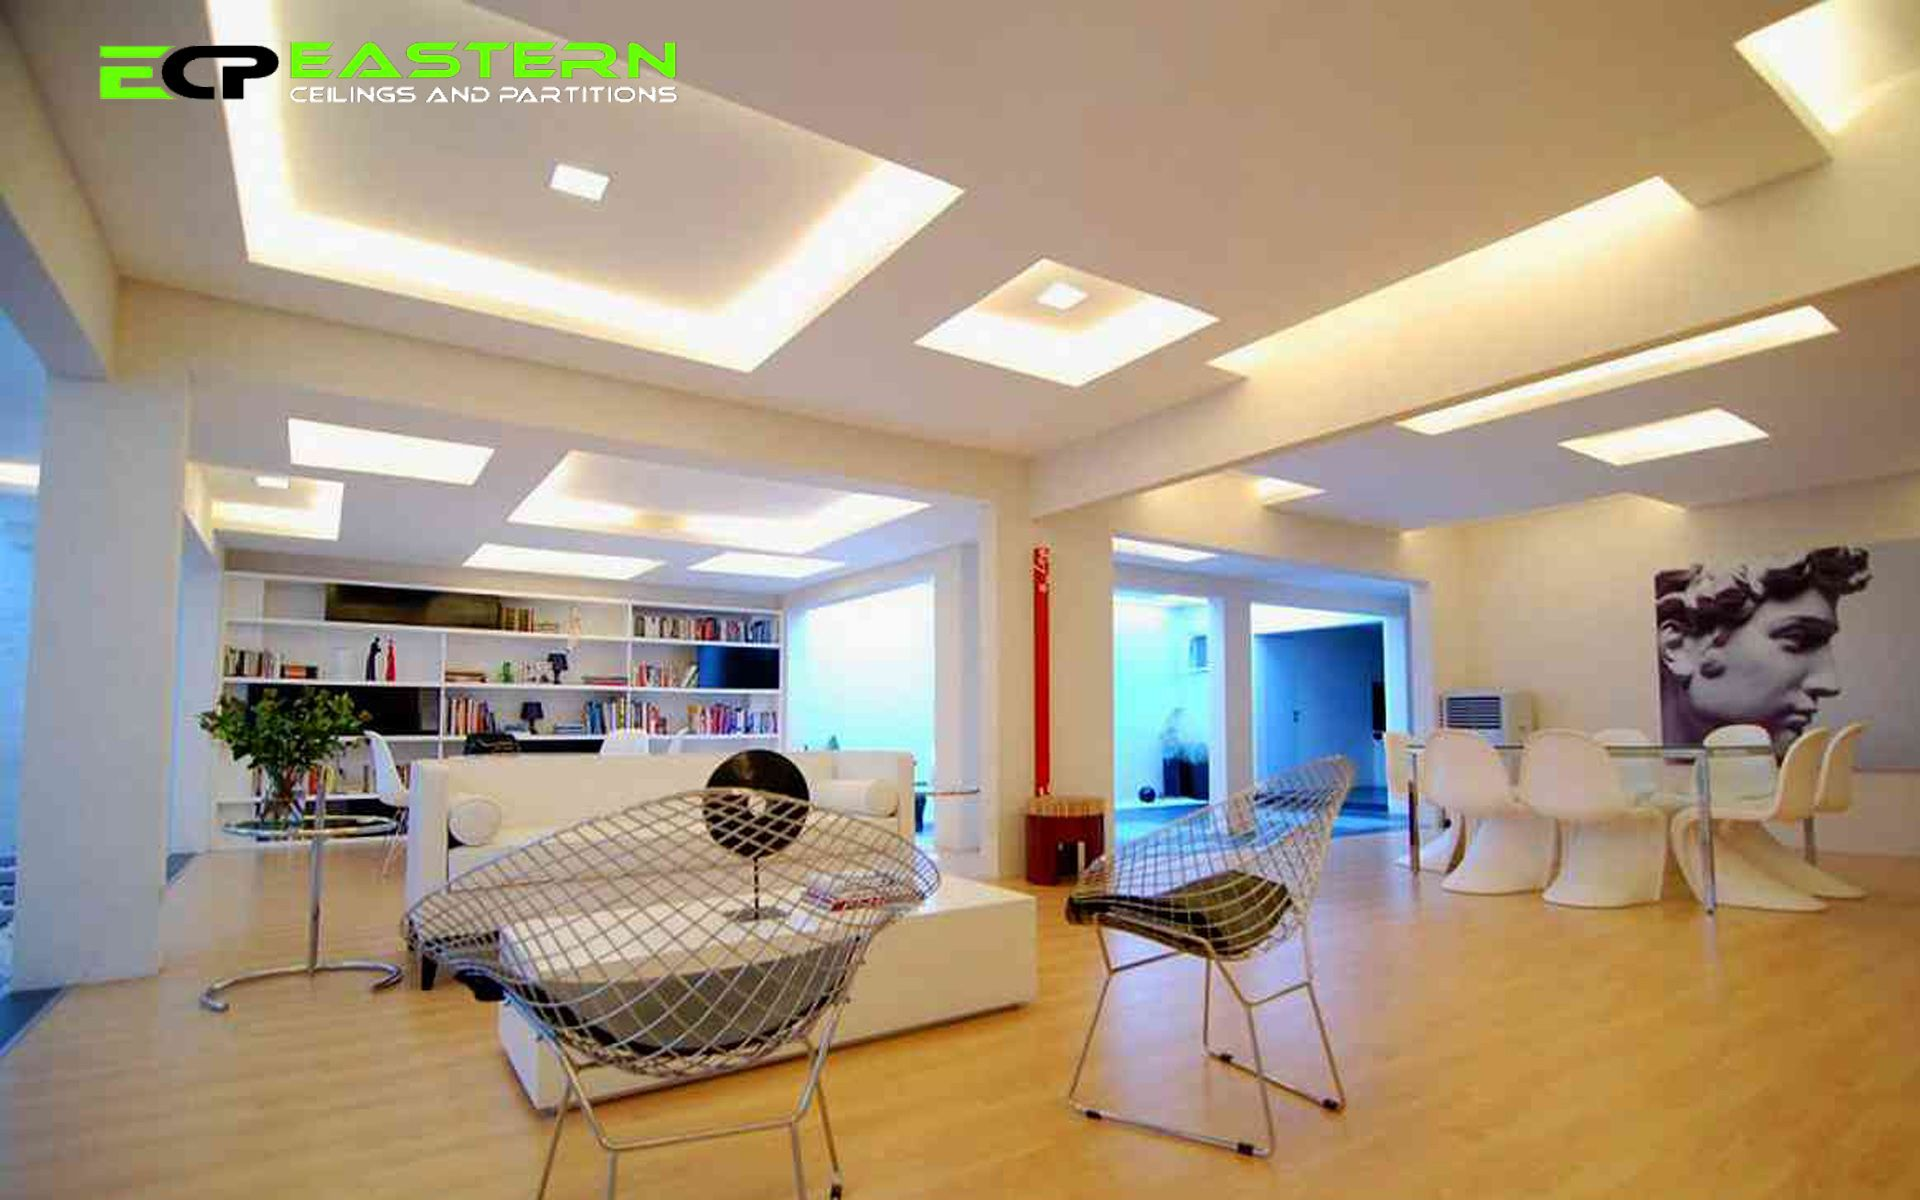 Ceiling Design For Kitchen Deluxe Living Room Ceiling Design For Home Pop Ceiling Designs